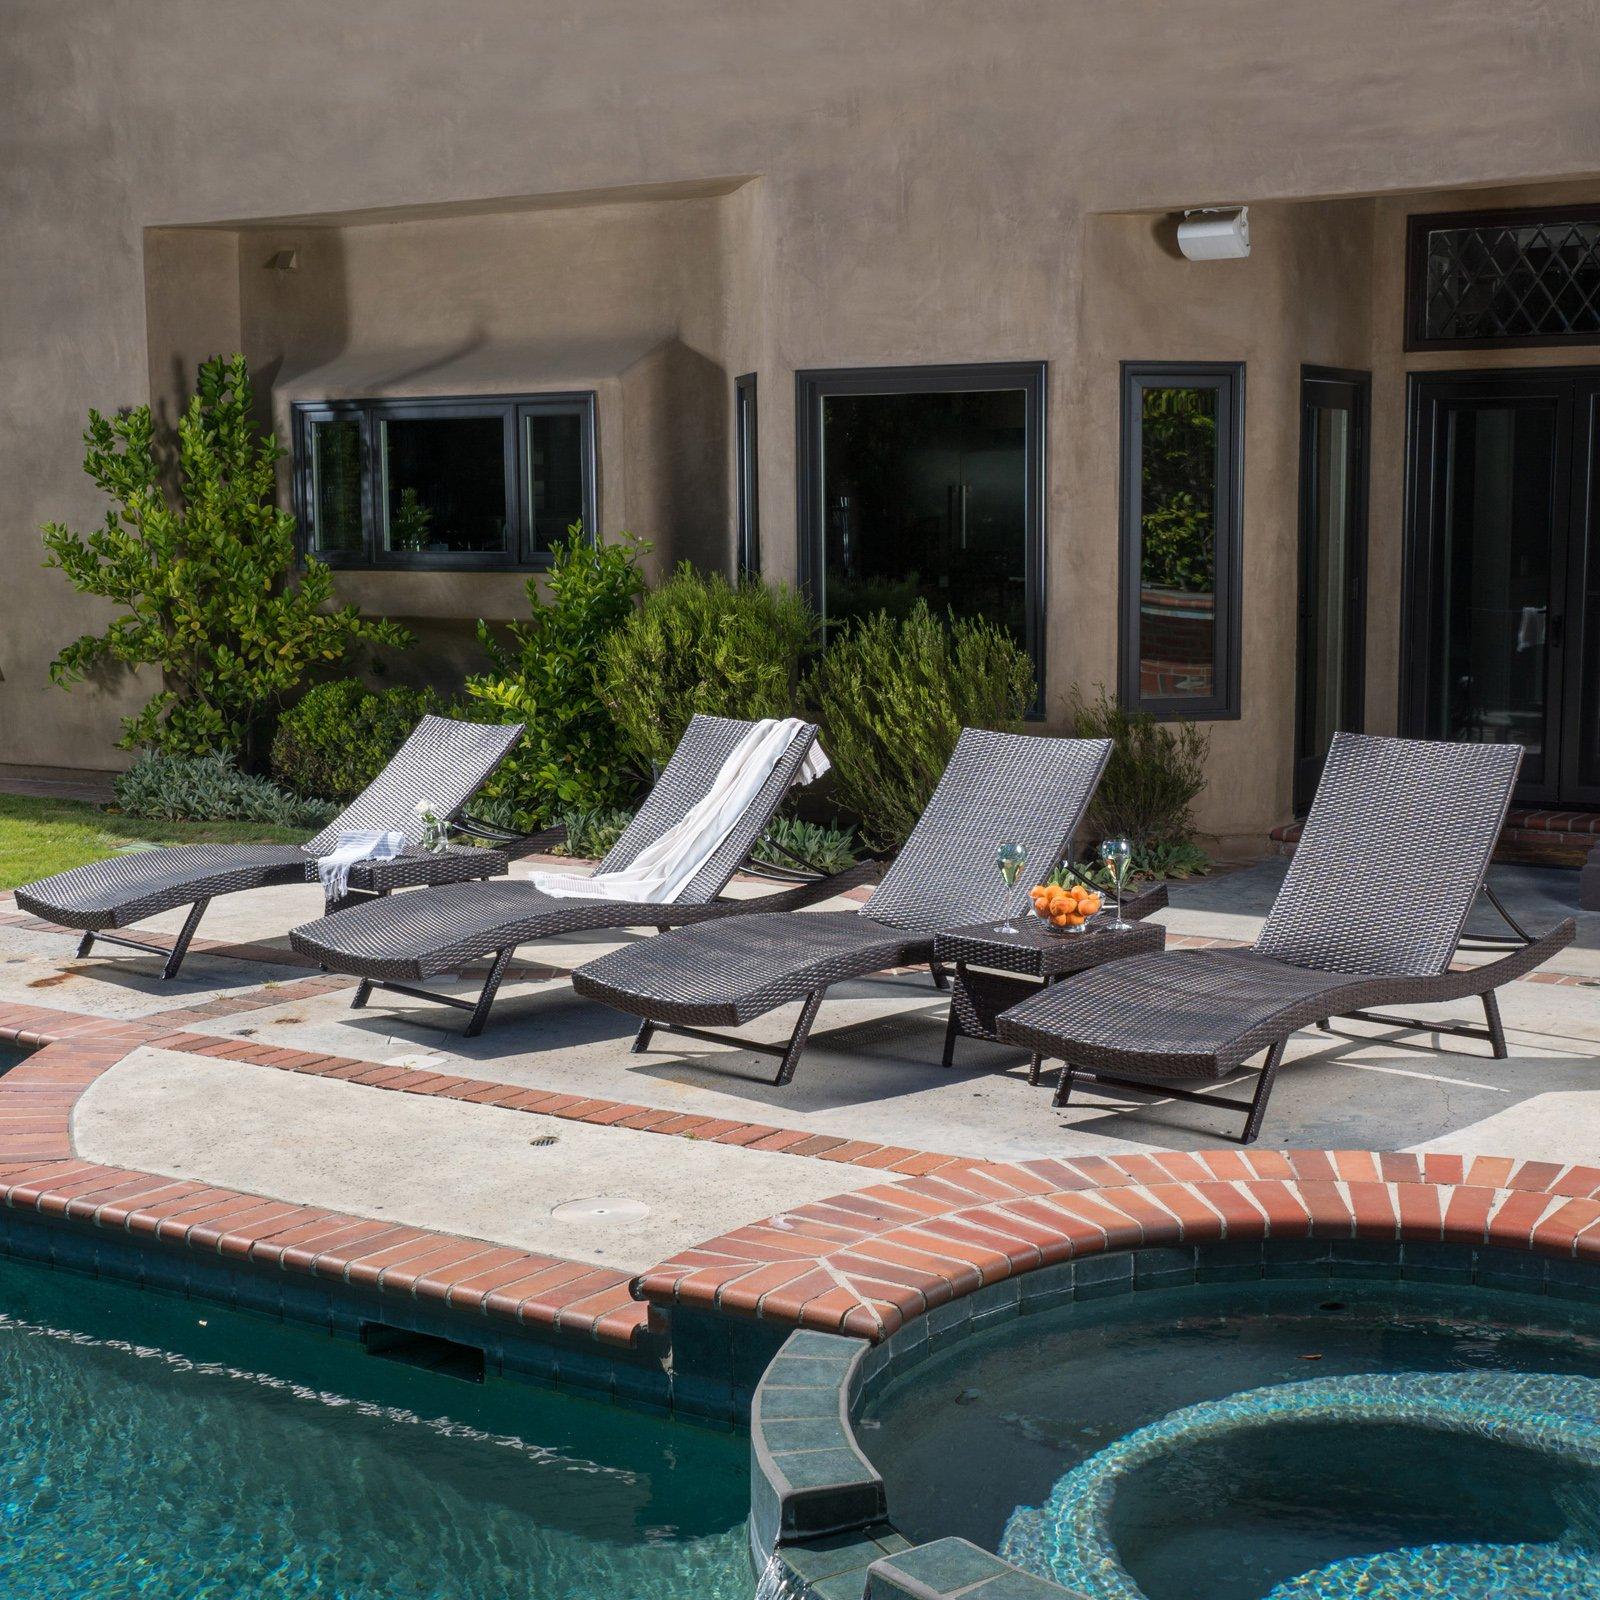 Best Selling Home Decor Kauai Wicker 6 Piece Chaise Lounge Set